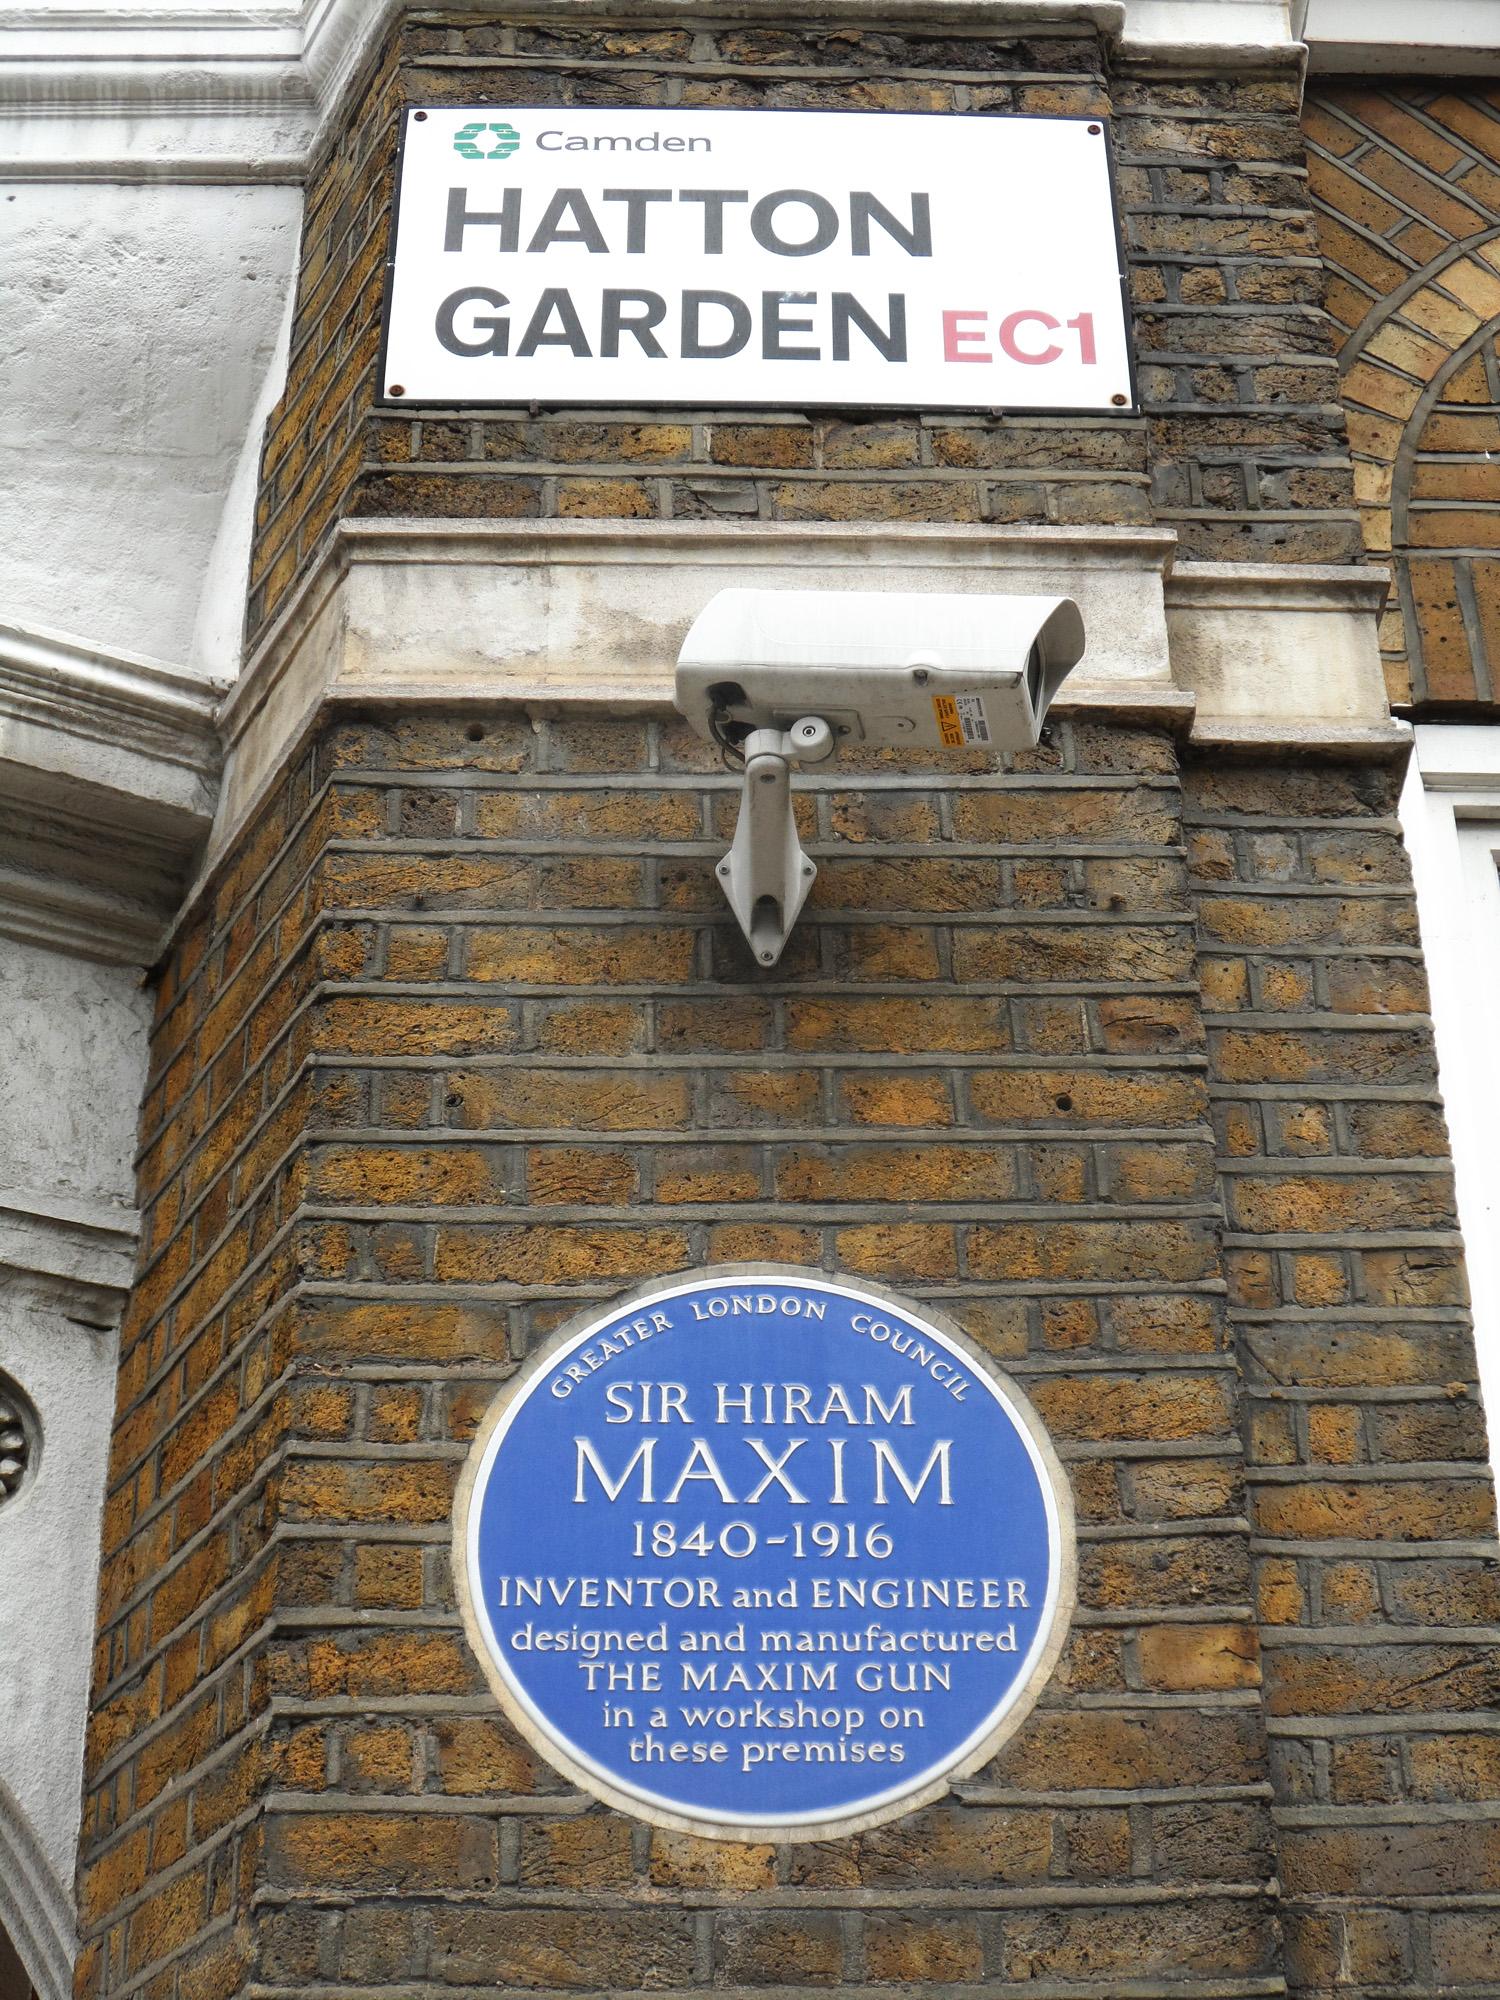 File:SIR HIRAM MAXIM   57d Hatton Garden Holborn London EC1N 8HP Med